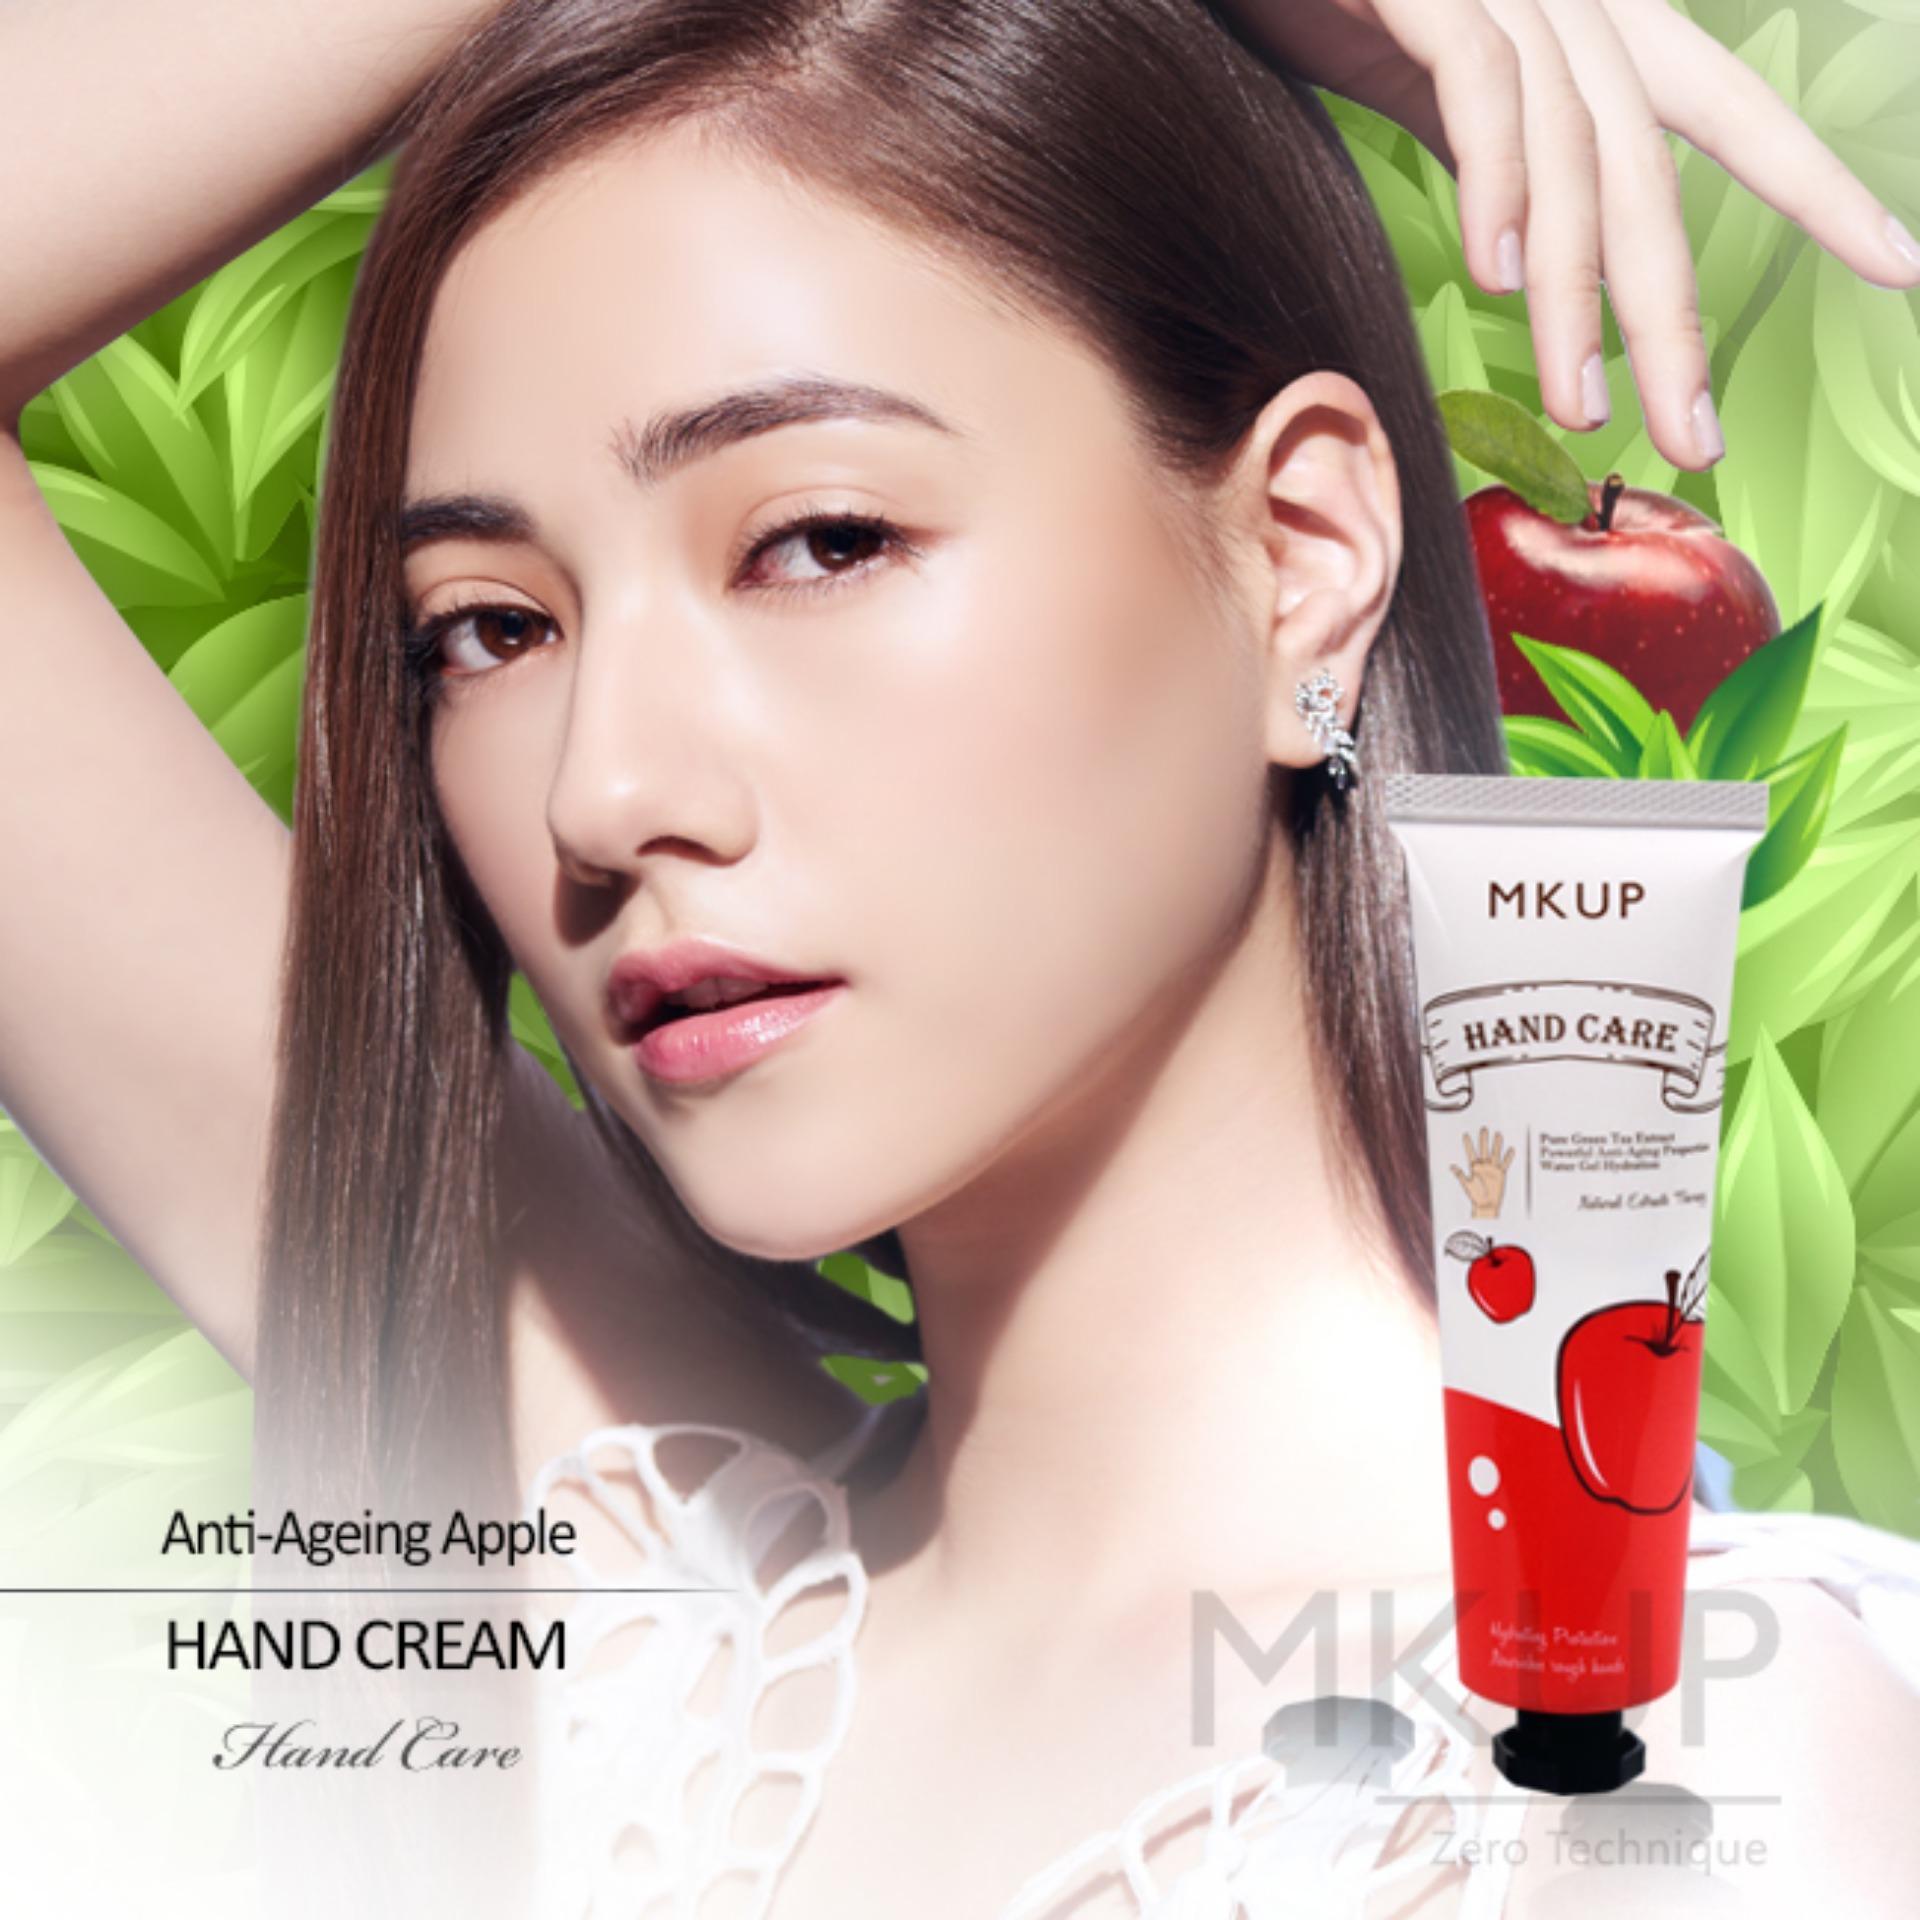 Top 10 Mkup® Hand Cream Anti Ageing Apple Hand Cream